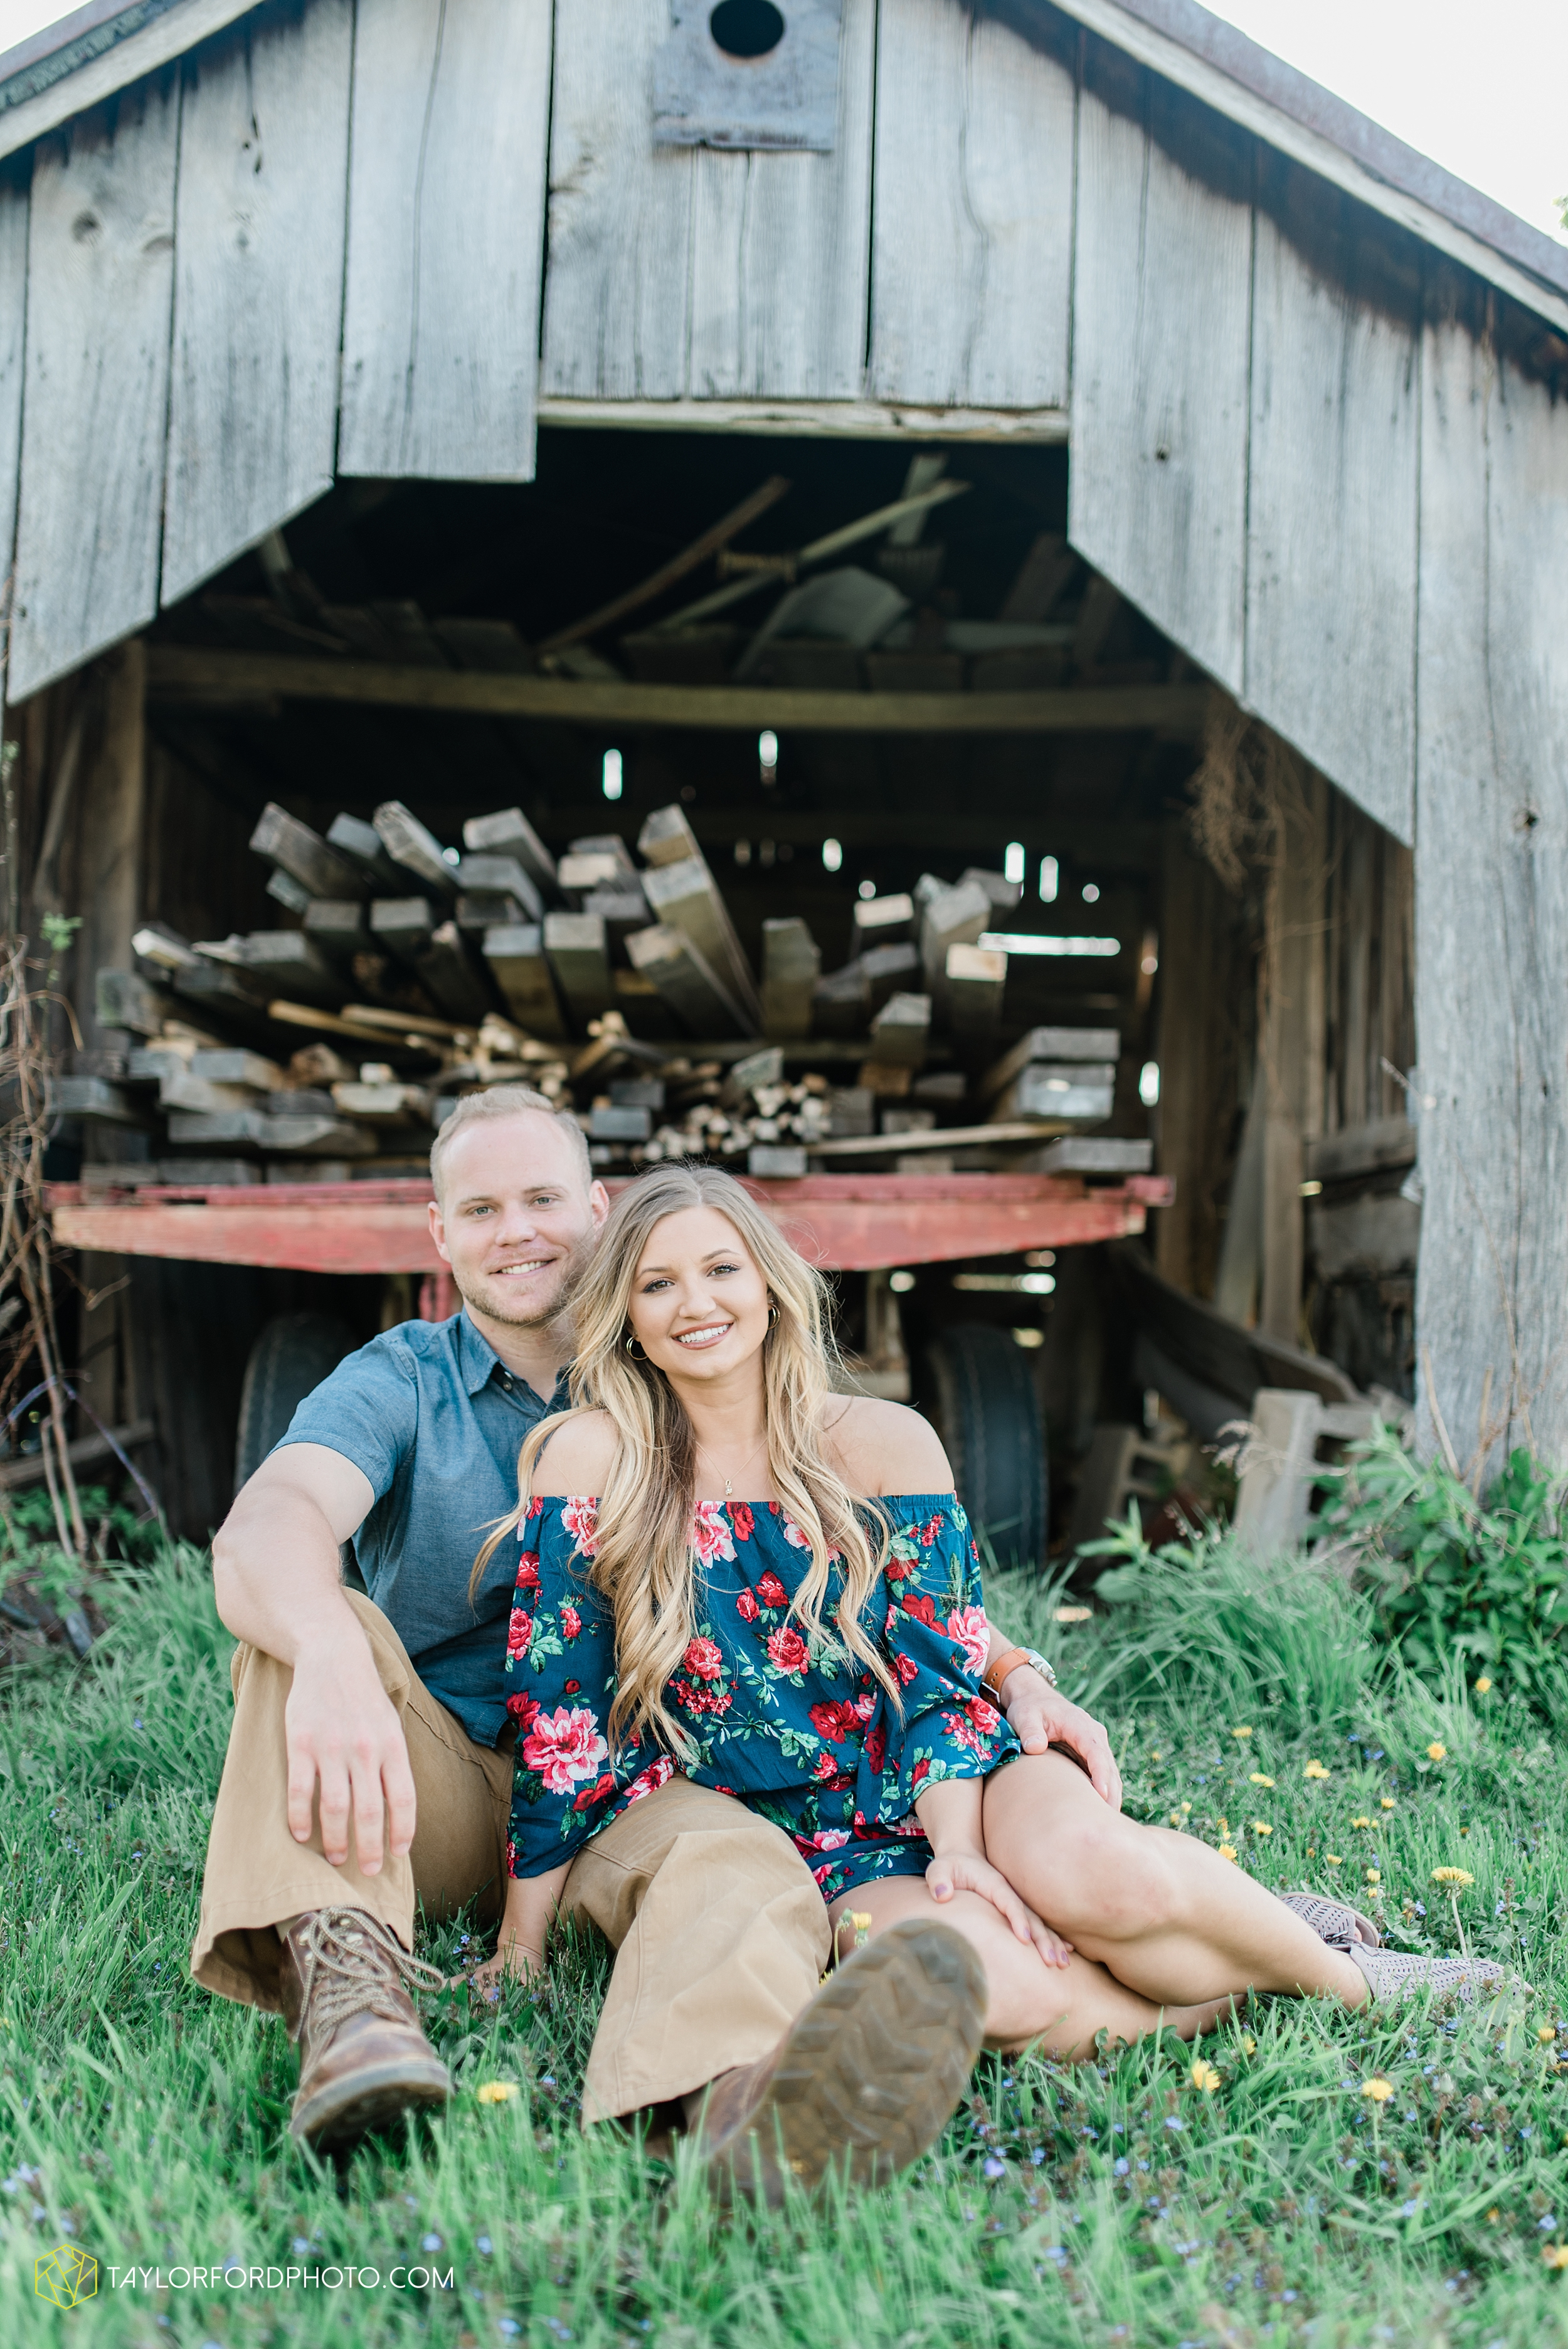 van-wert-ohio-spring-farm-engagement-photographer-photographer-Taylor-Ford-Photography_7089.jpg